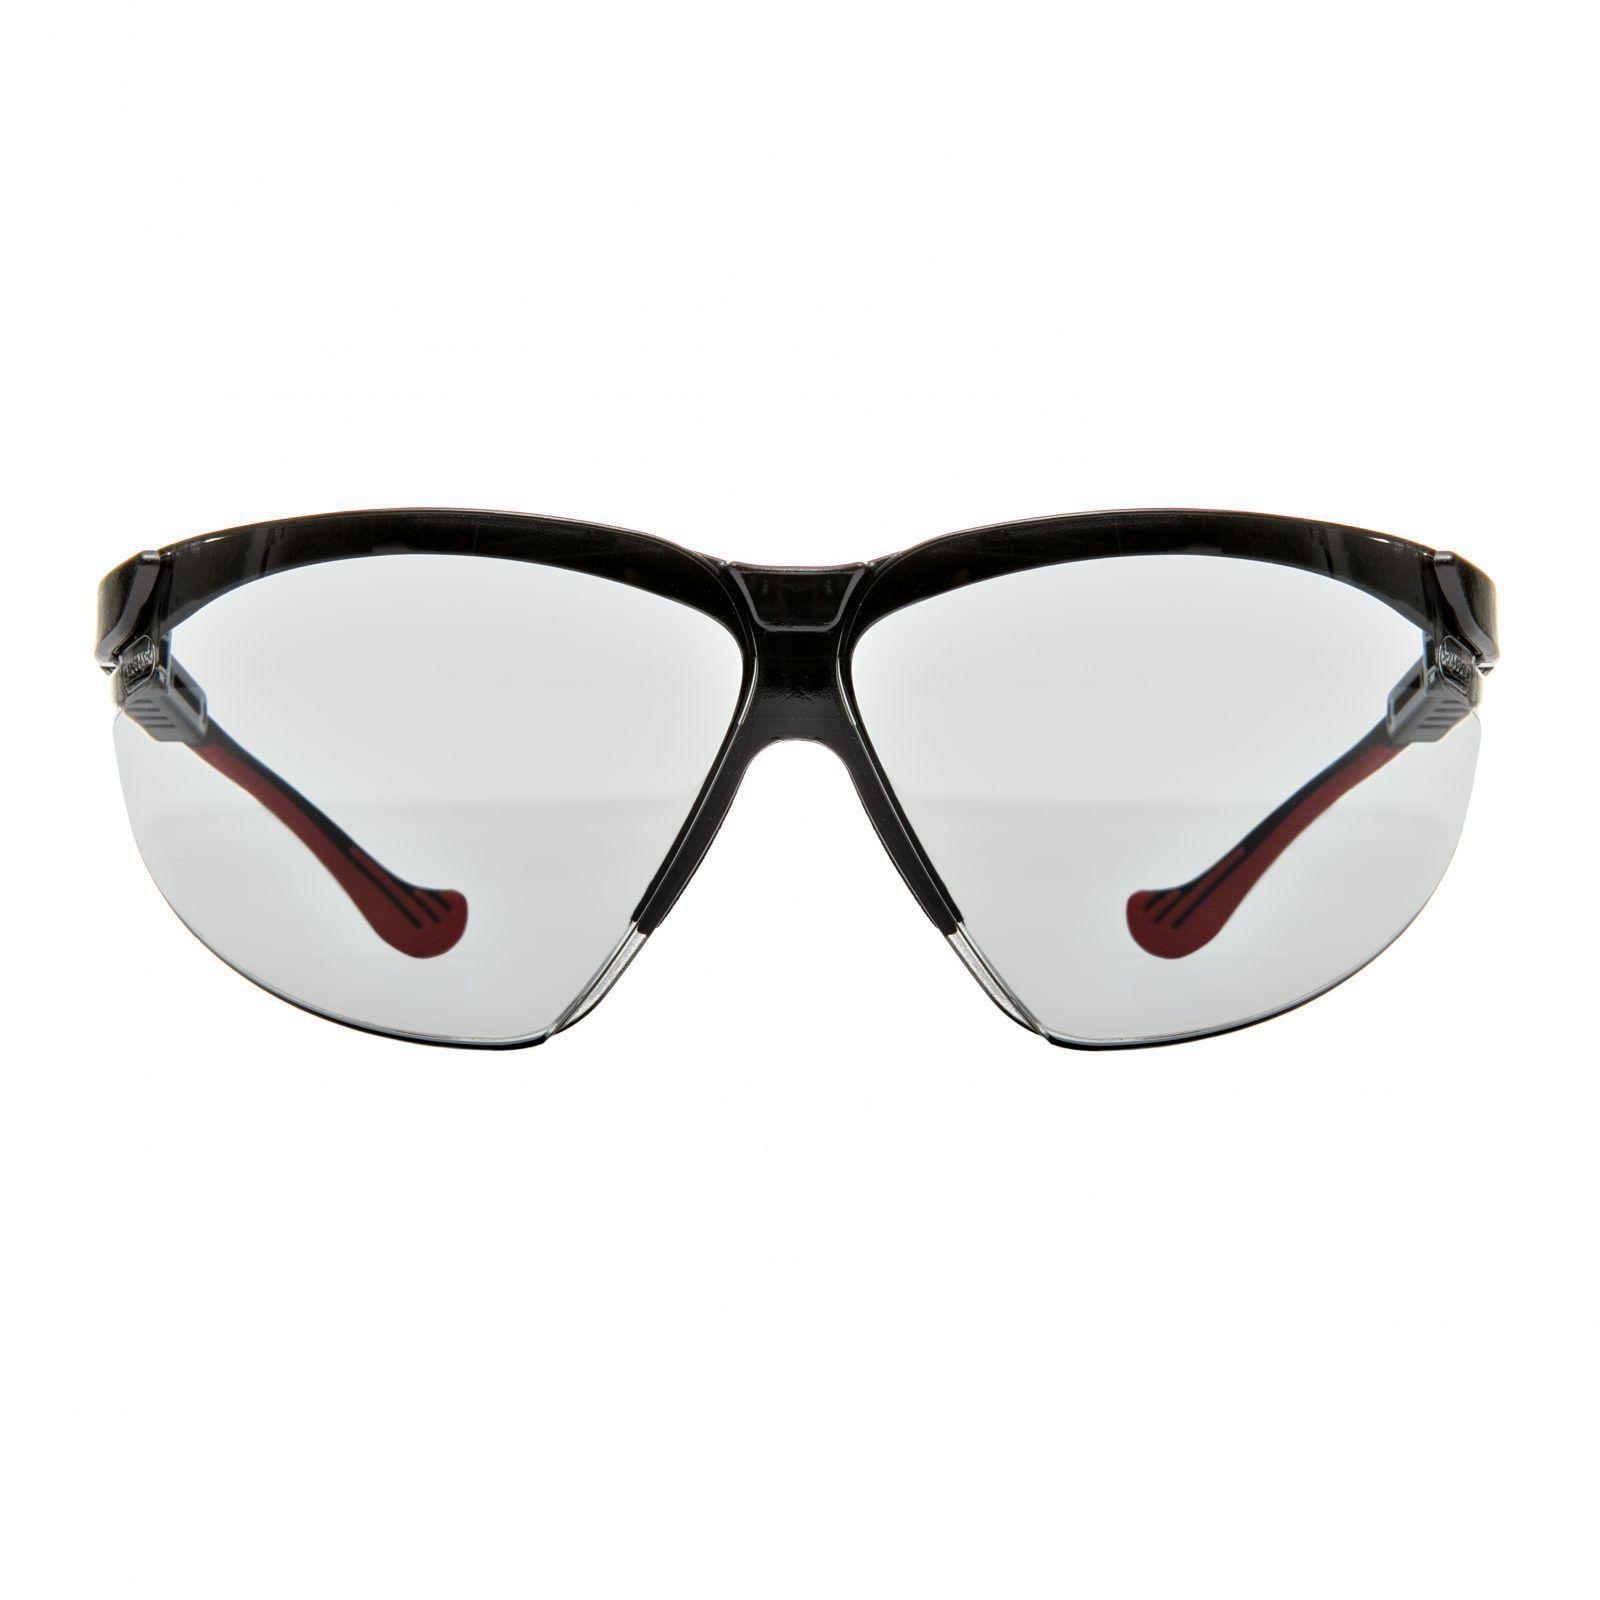 Óculos Uvex Supremo Tático Militar Honeywell - Genesis BALÍSTICO CHUMBO